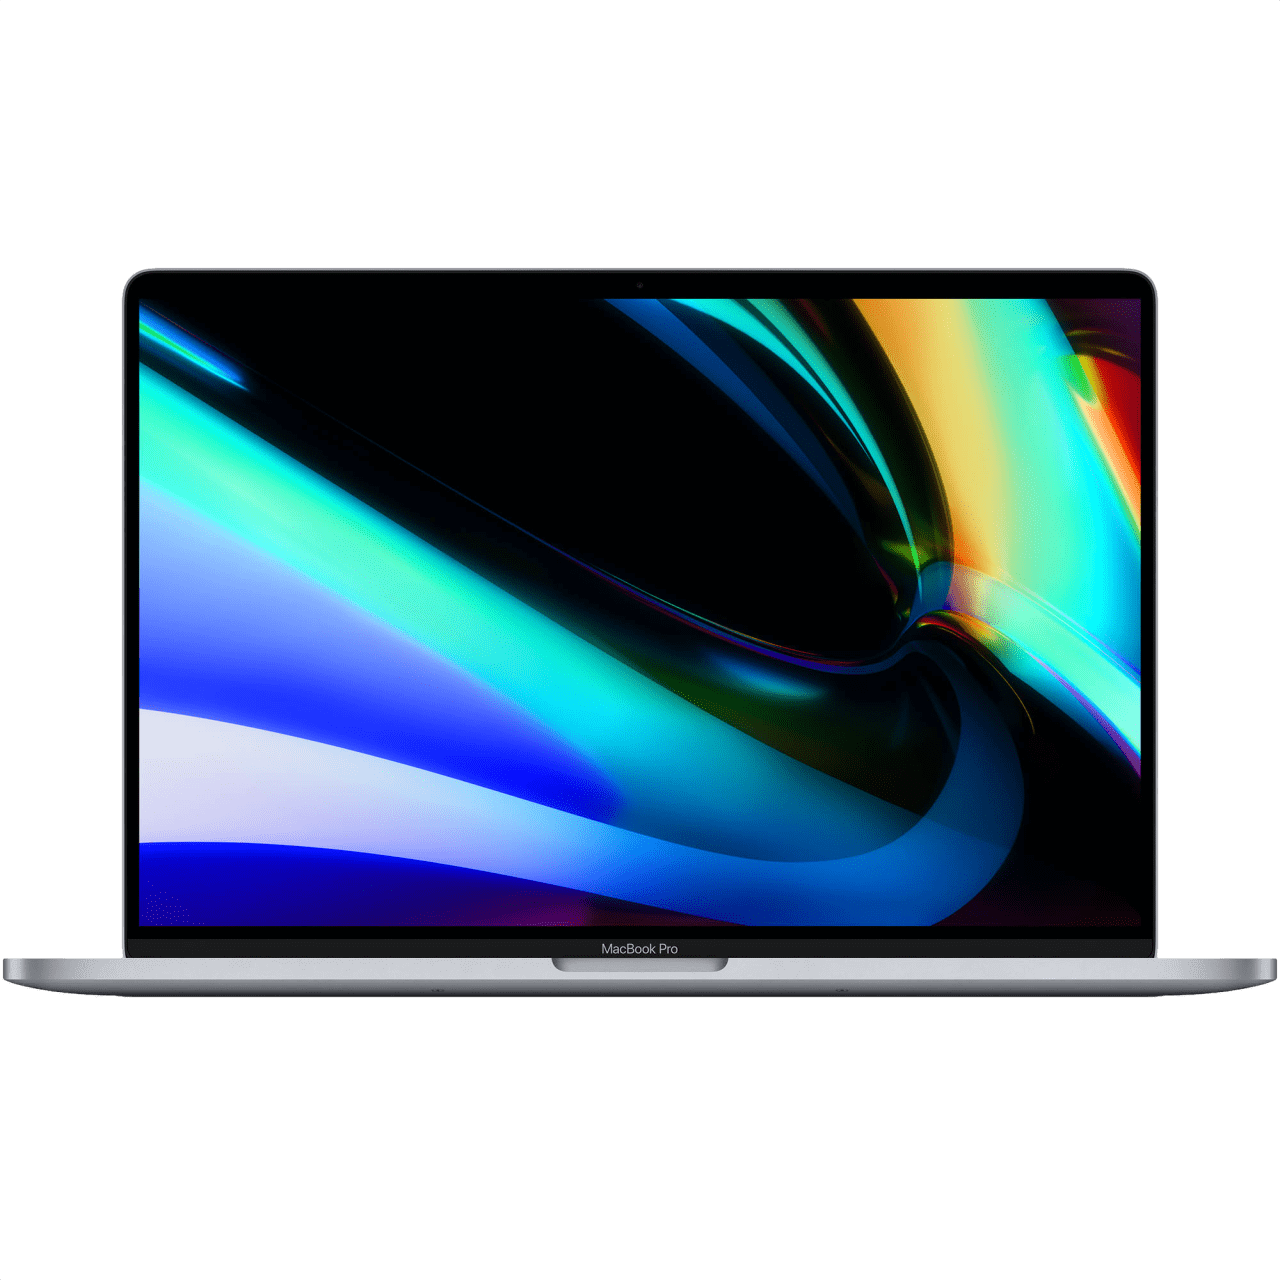 "Silver Apple 16"" MacBook Pro (Late 2019) - English (QWERTY) Laptop - Intel® Core™ i7-9750H - 16GB - 512GB SSD - AMD Radeon Pro 5300M.1"